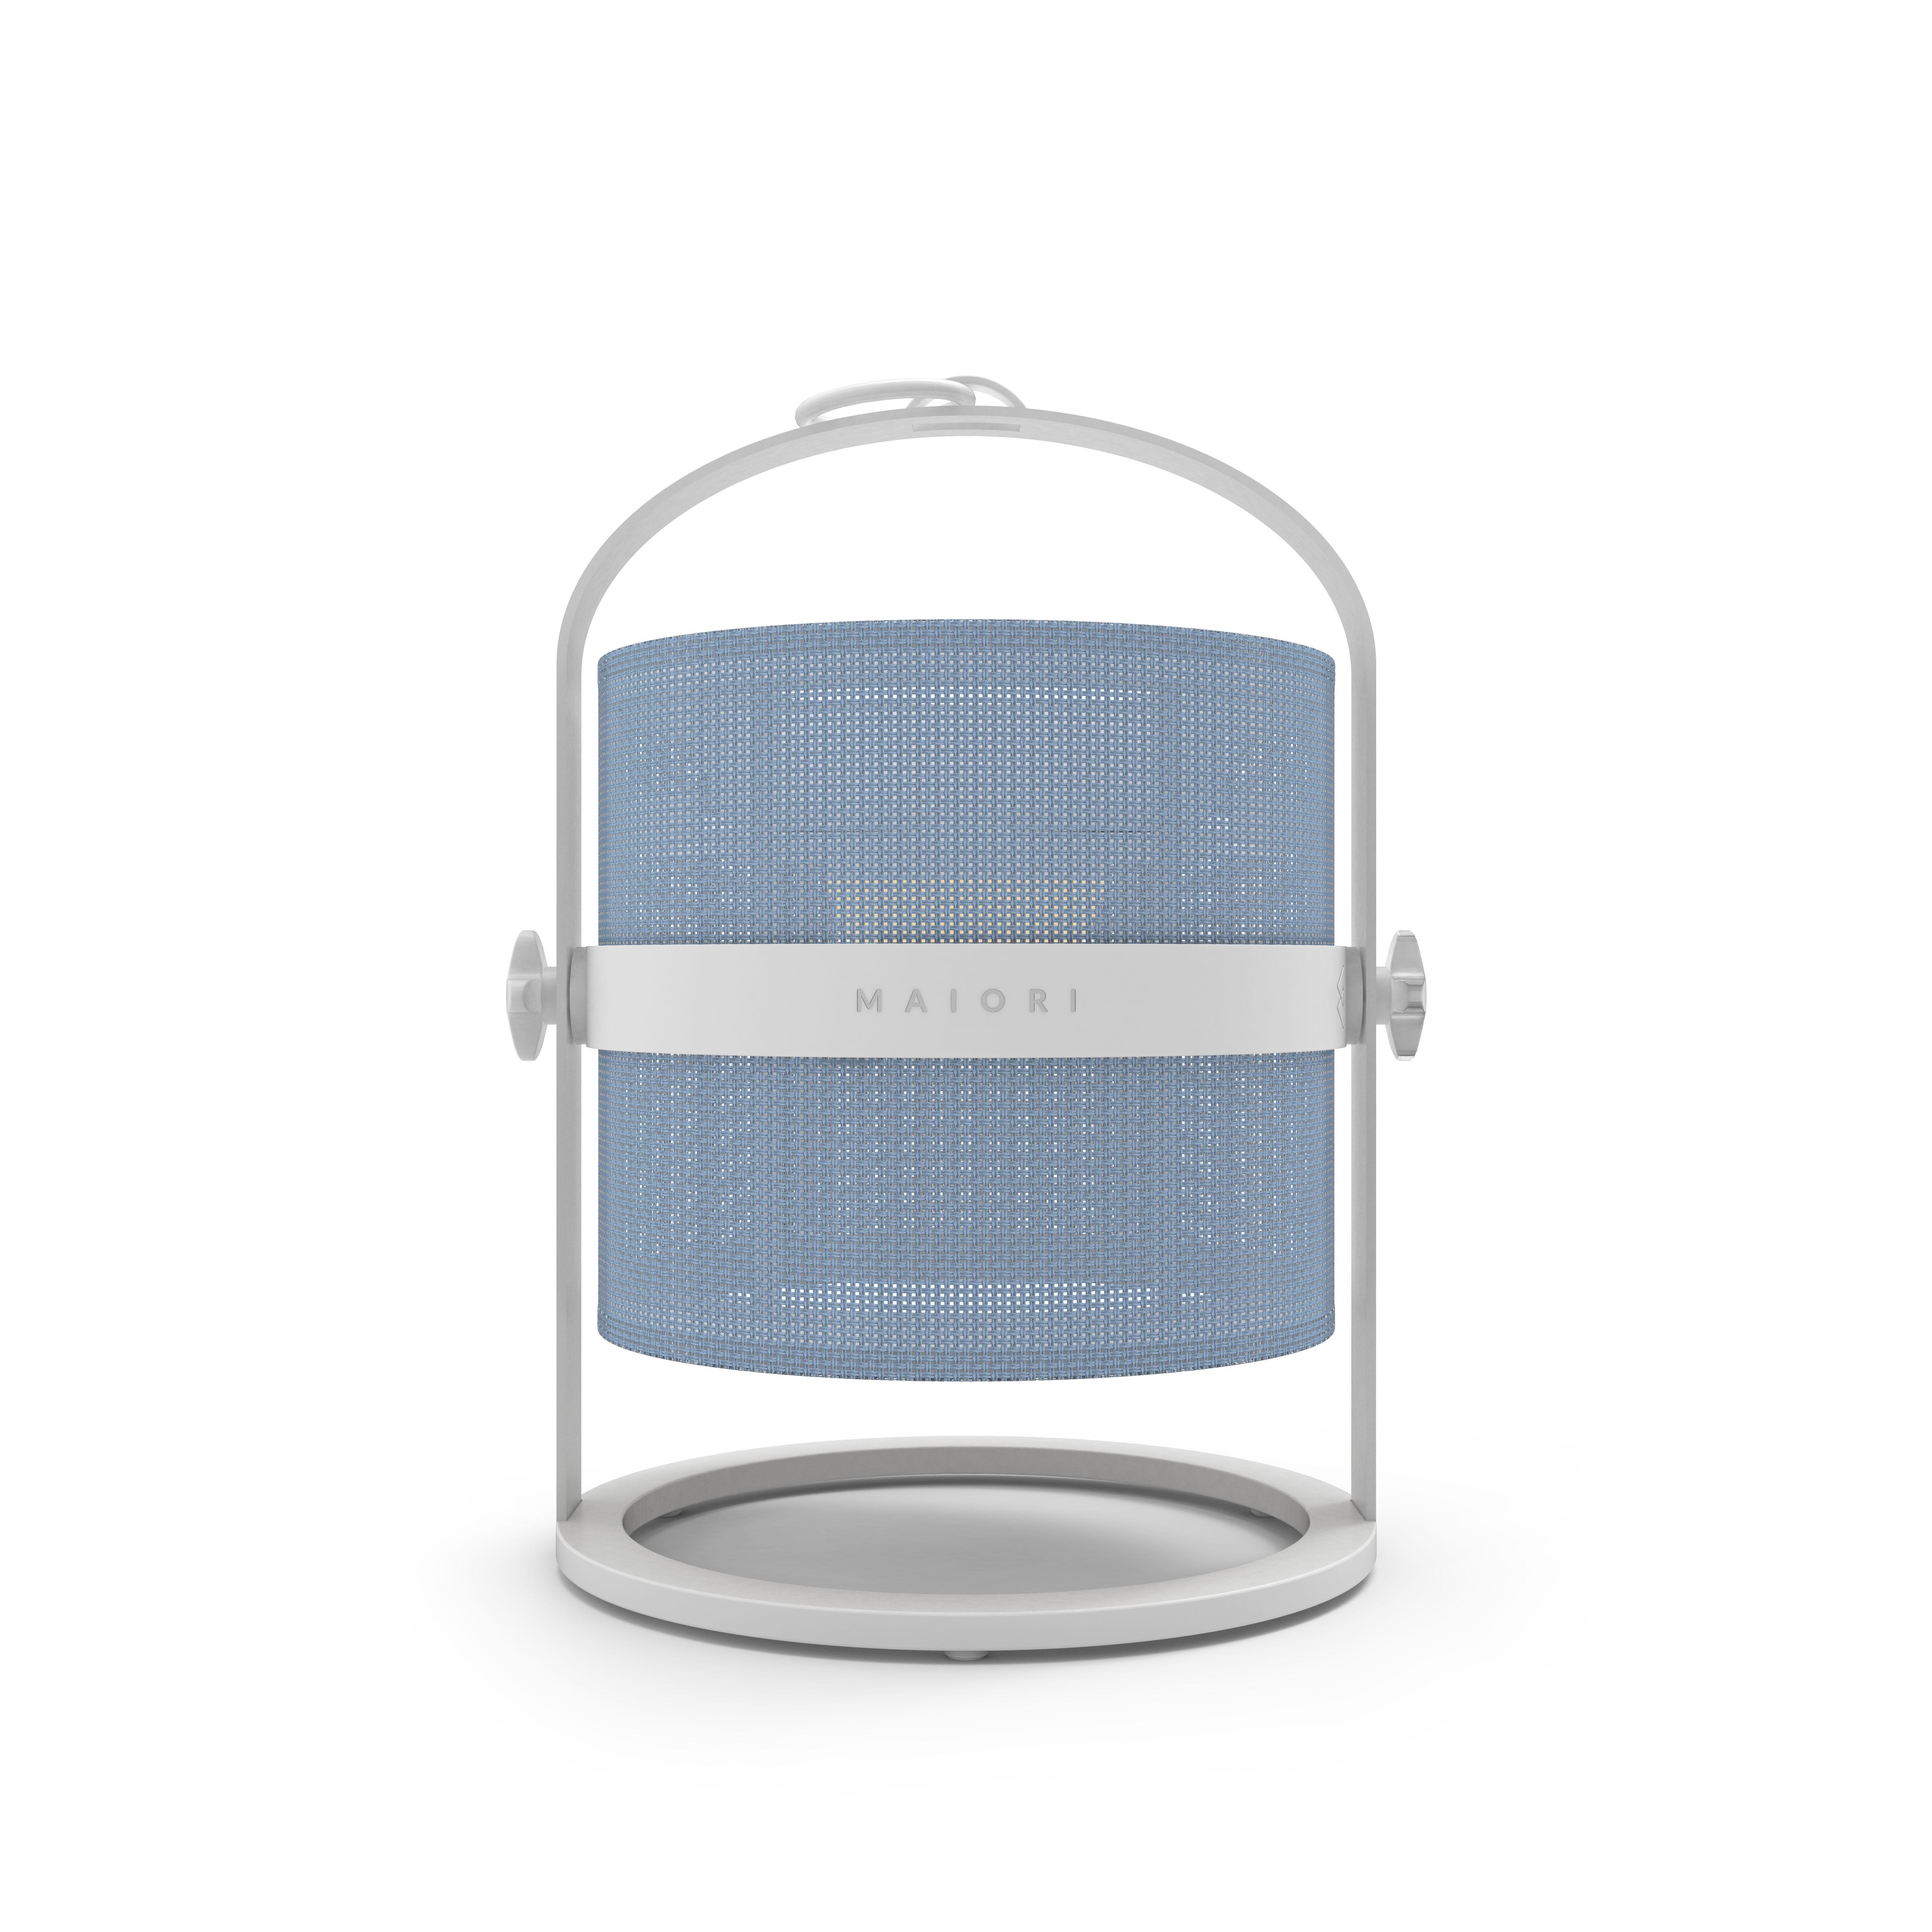 Lighting - Table Lamps - La Lampe Petite LED Solar lamp - Solar - White structure by Maiori - Structure : White - Diffuser : Royal Blue - Aluminium, Technical fabric